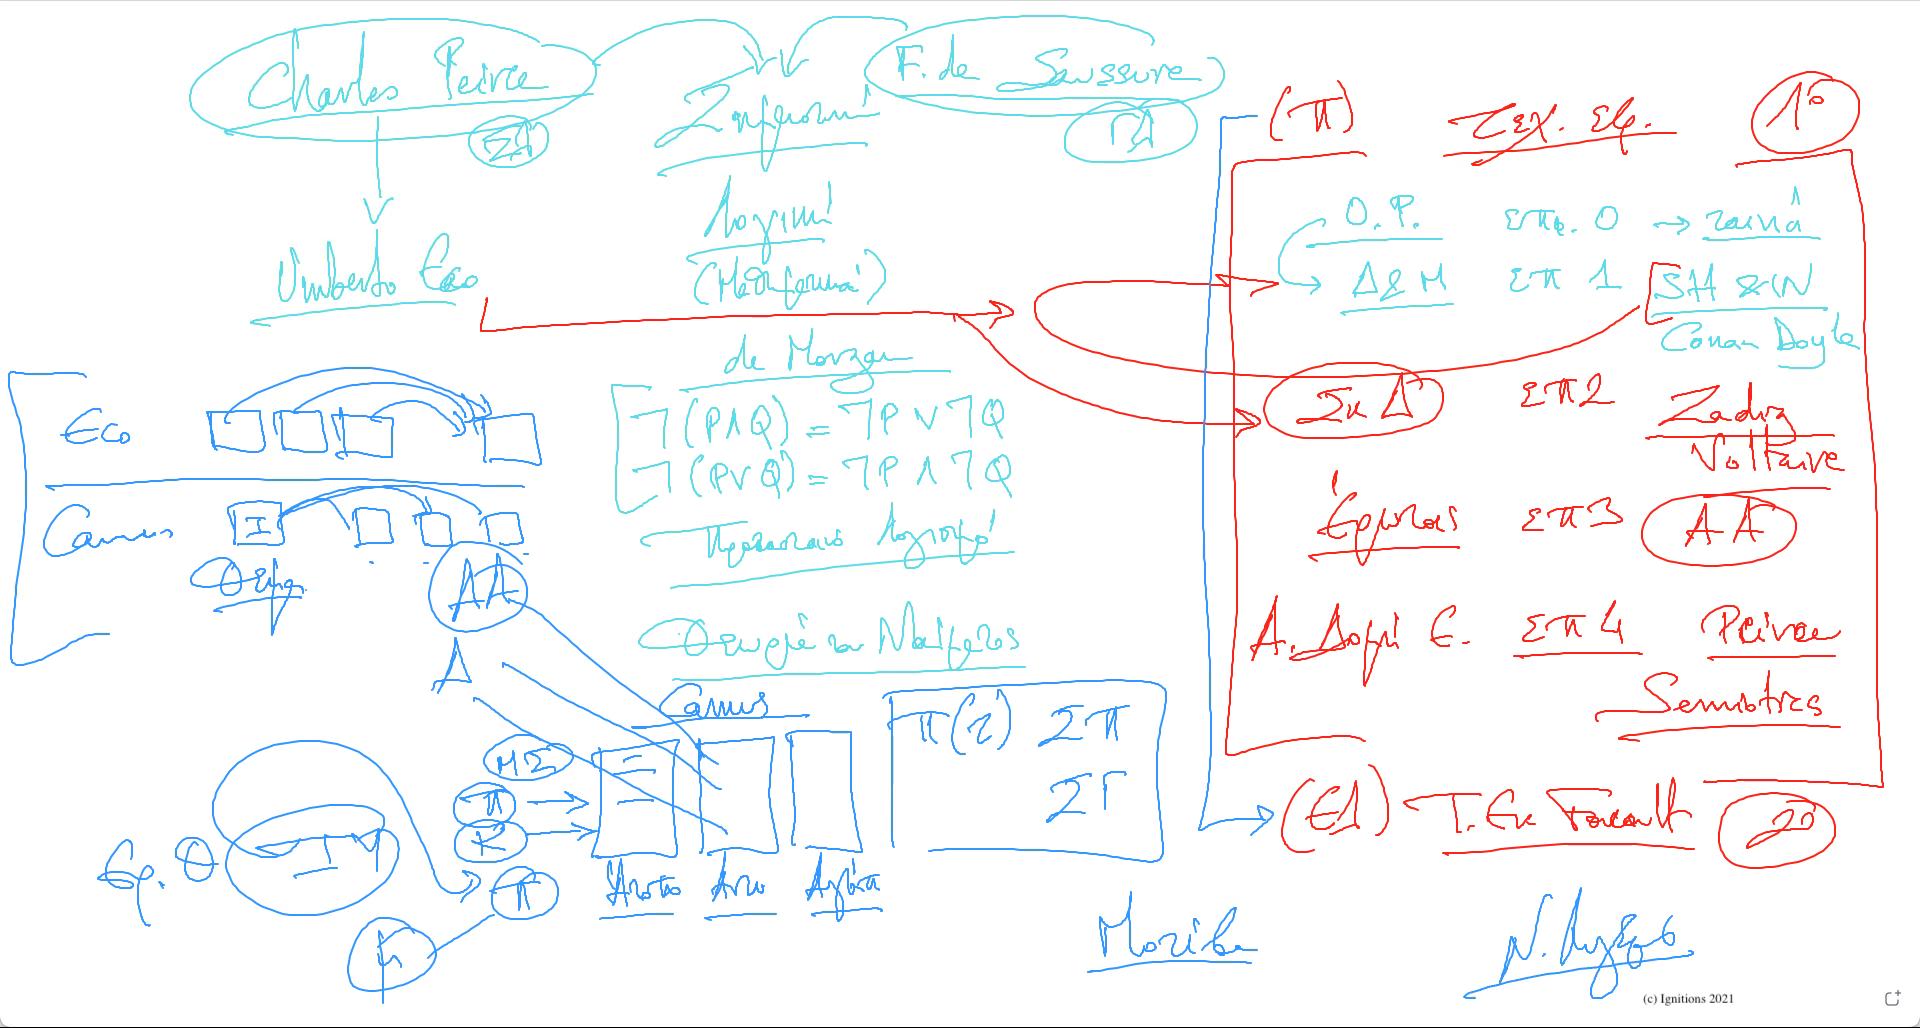 57820 - I - e-Μάθημα: Ο πολλαπλός κόσμος τουUmberto Eco. (Dessin)